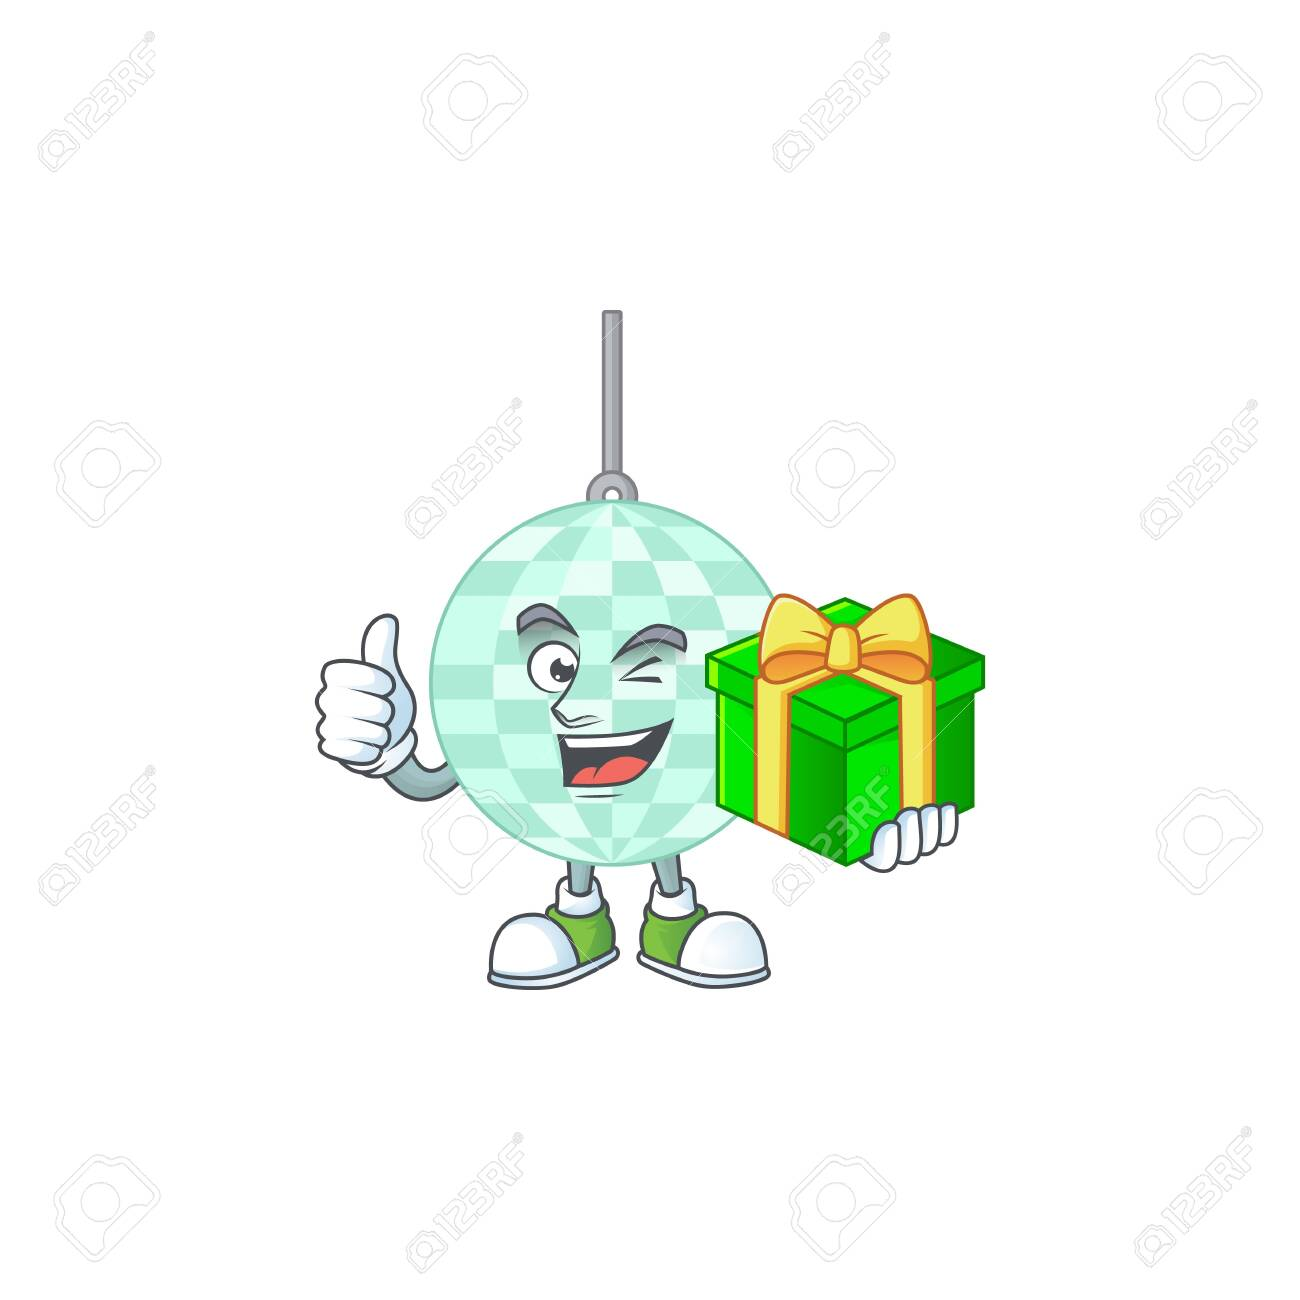 Happy smiley disco ball cartoon mascot design with a gift box - 147963506